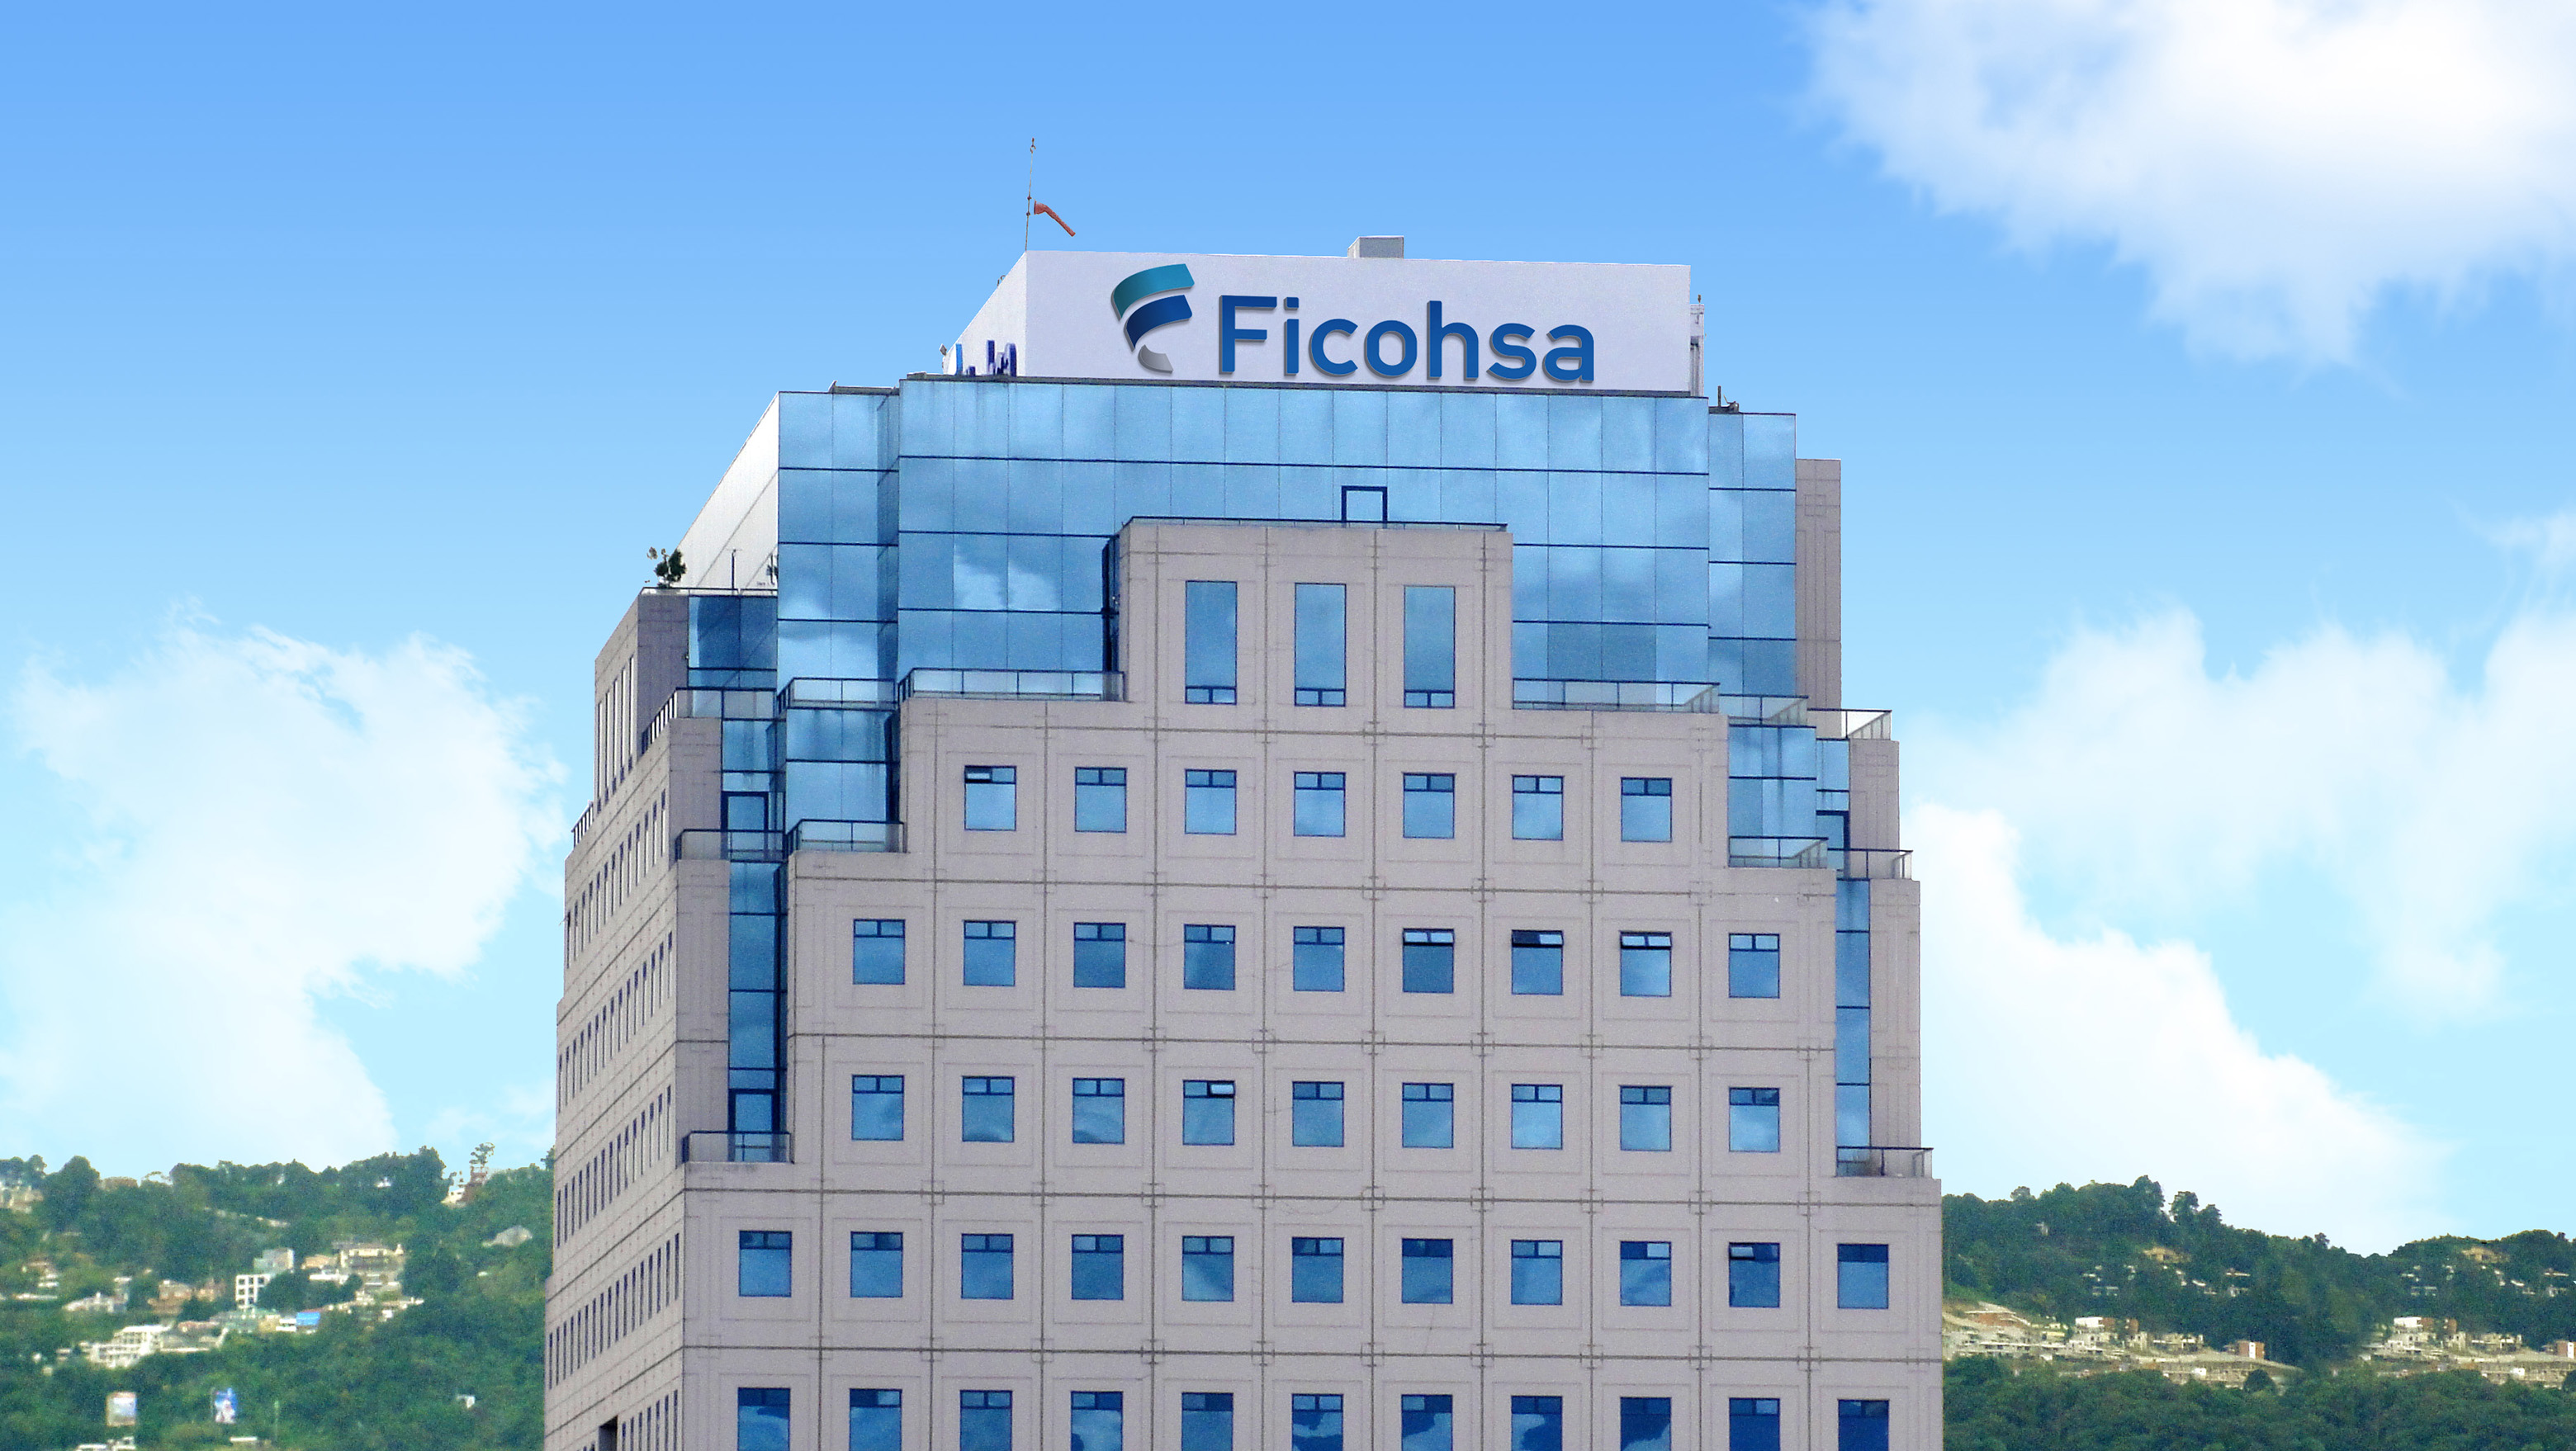 Euromoney selecciona a Ficohsa como el mejor banco administrado en Centroamérica